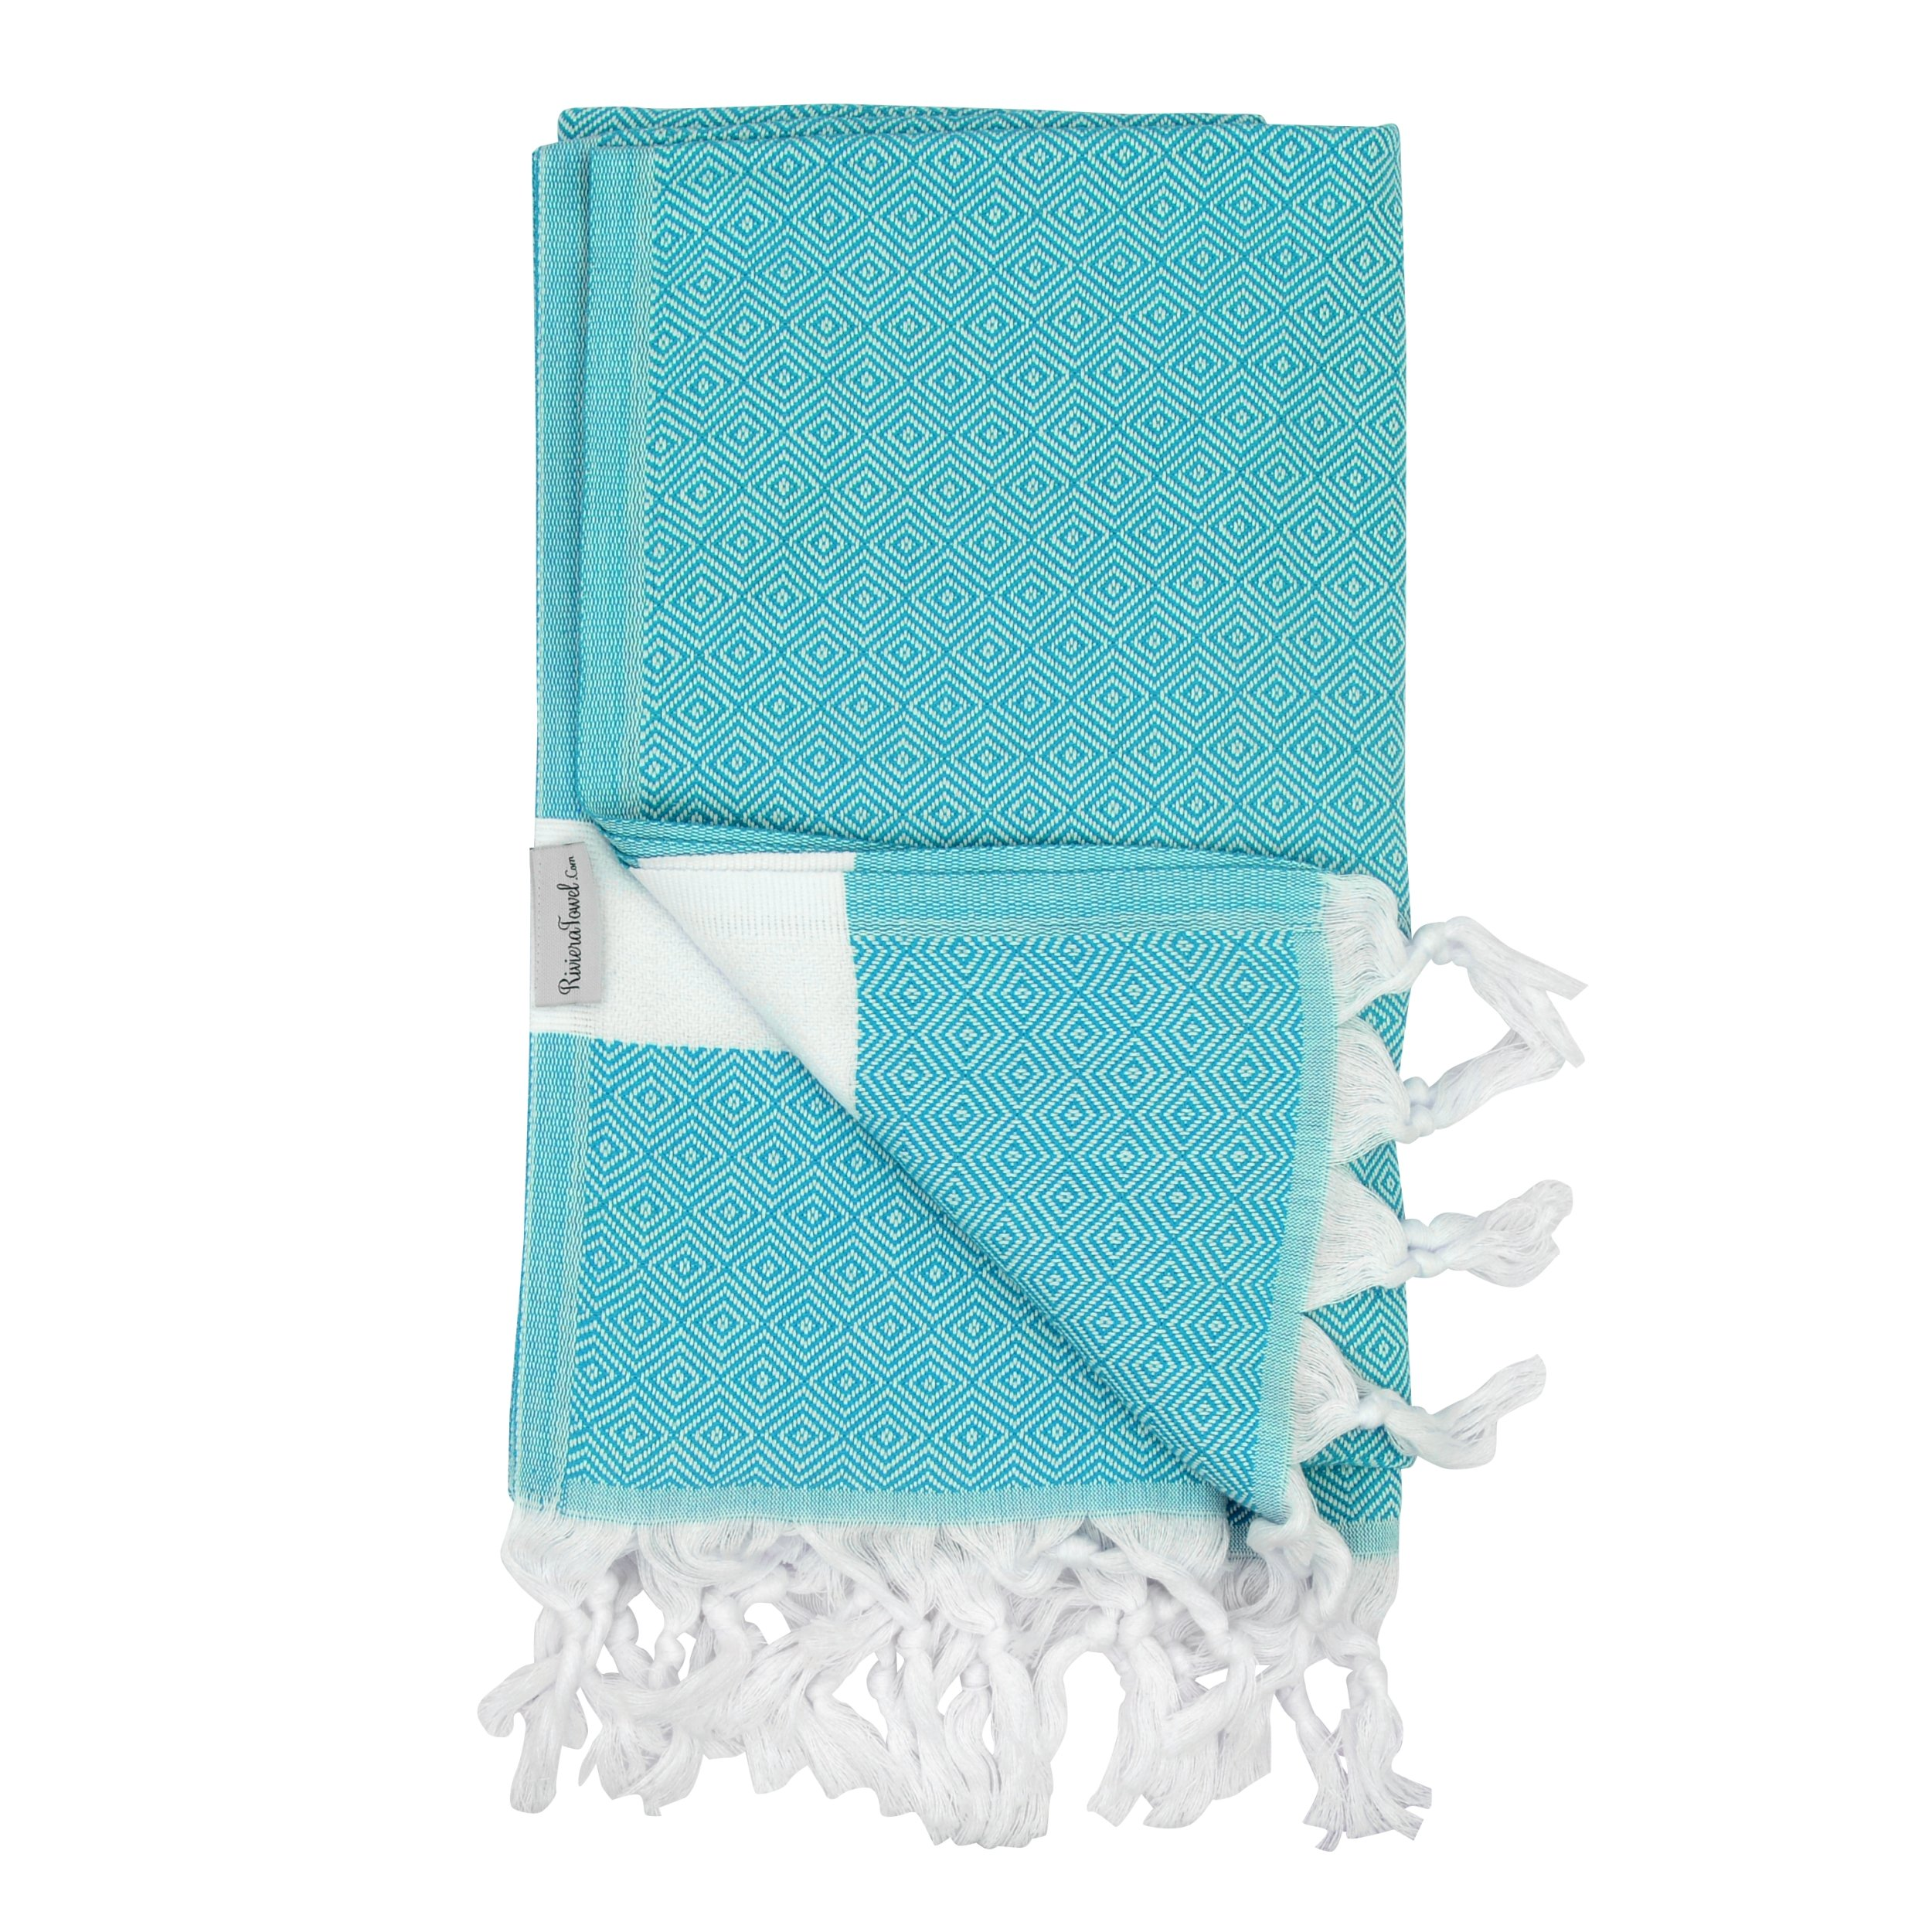 Turquoise Diamond Turkish Towel - Naturally Dyed 100% Cotton - 70x39 inches - Beach Bath Pool Yoga Pilates Picnic Blanket Scarf Wrap Hammam Fouta Turkish Bath Towels Peshtemal